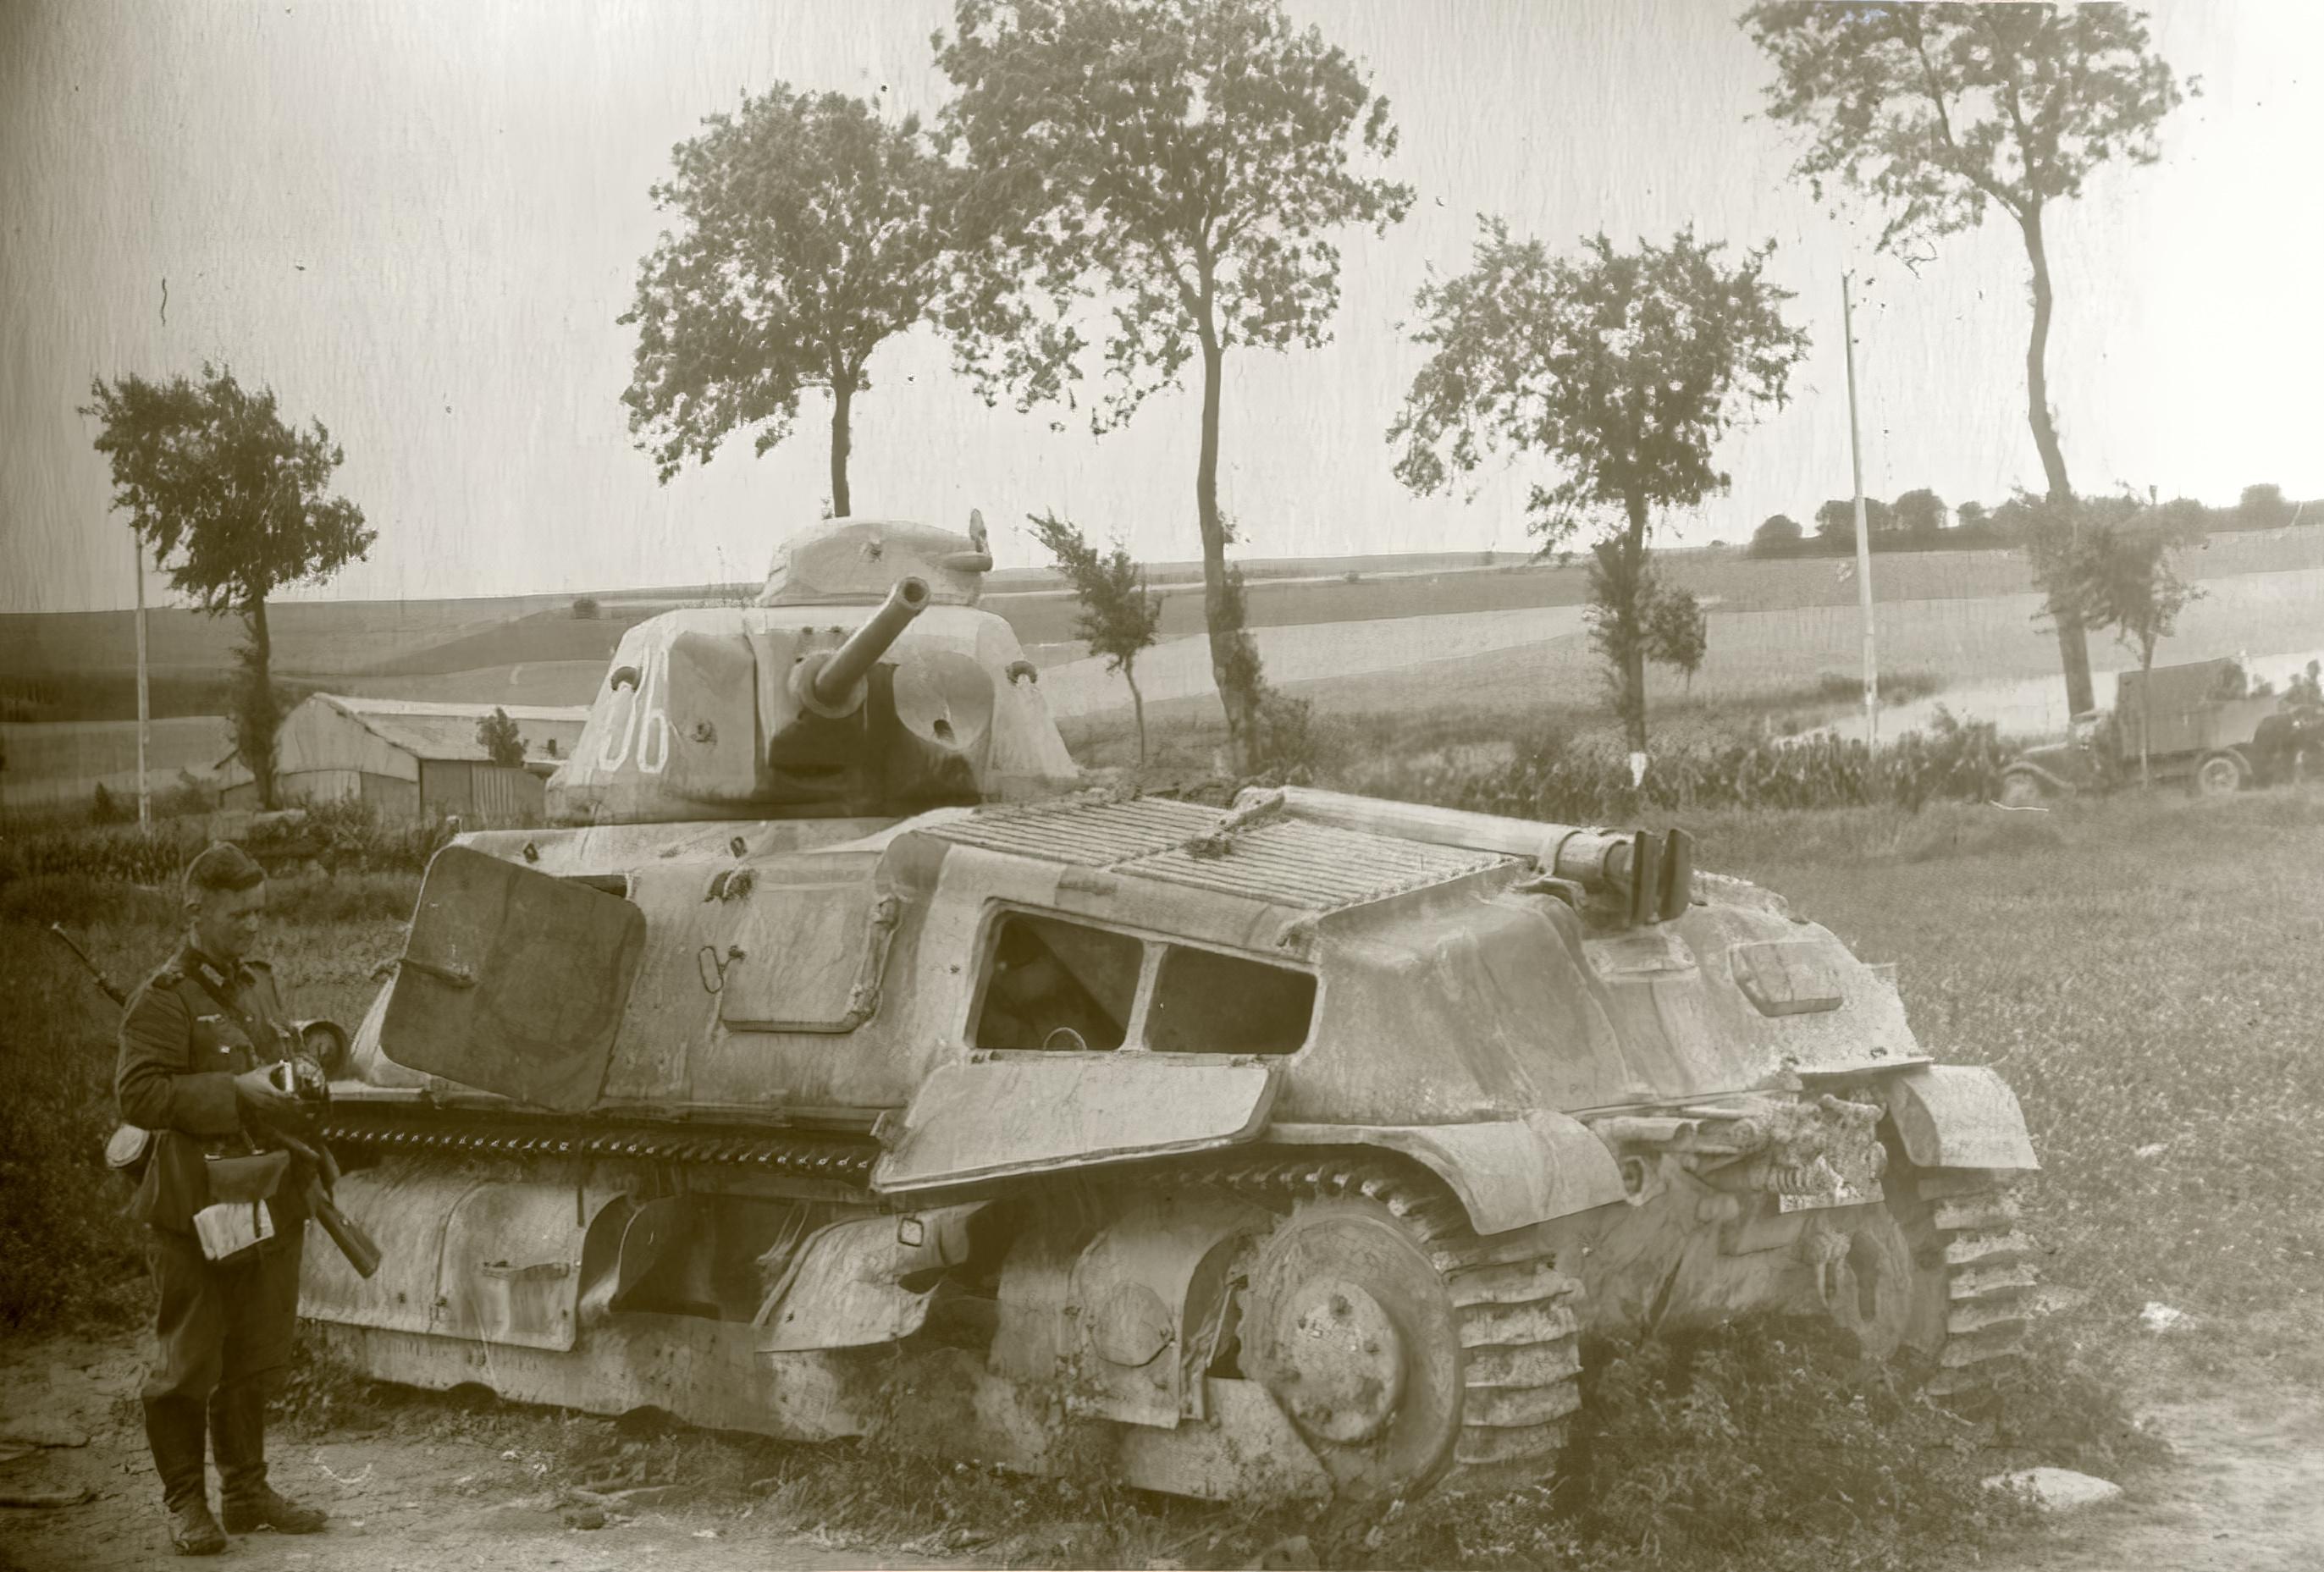 French Army Somua S35 White 36 abandoned along a roadside France June 1940 ebay 02